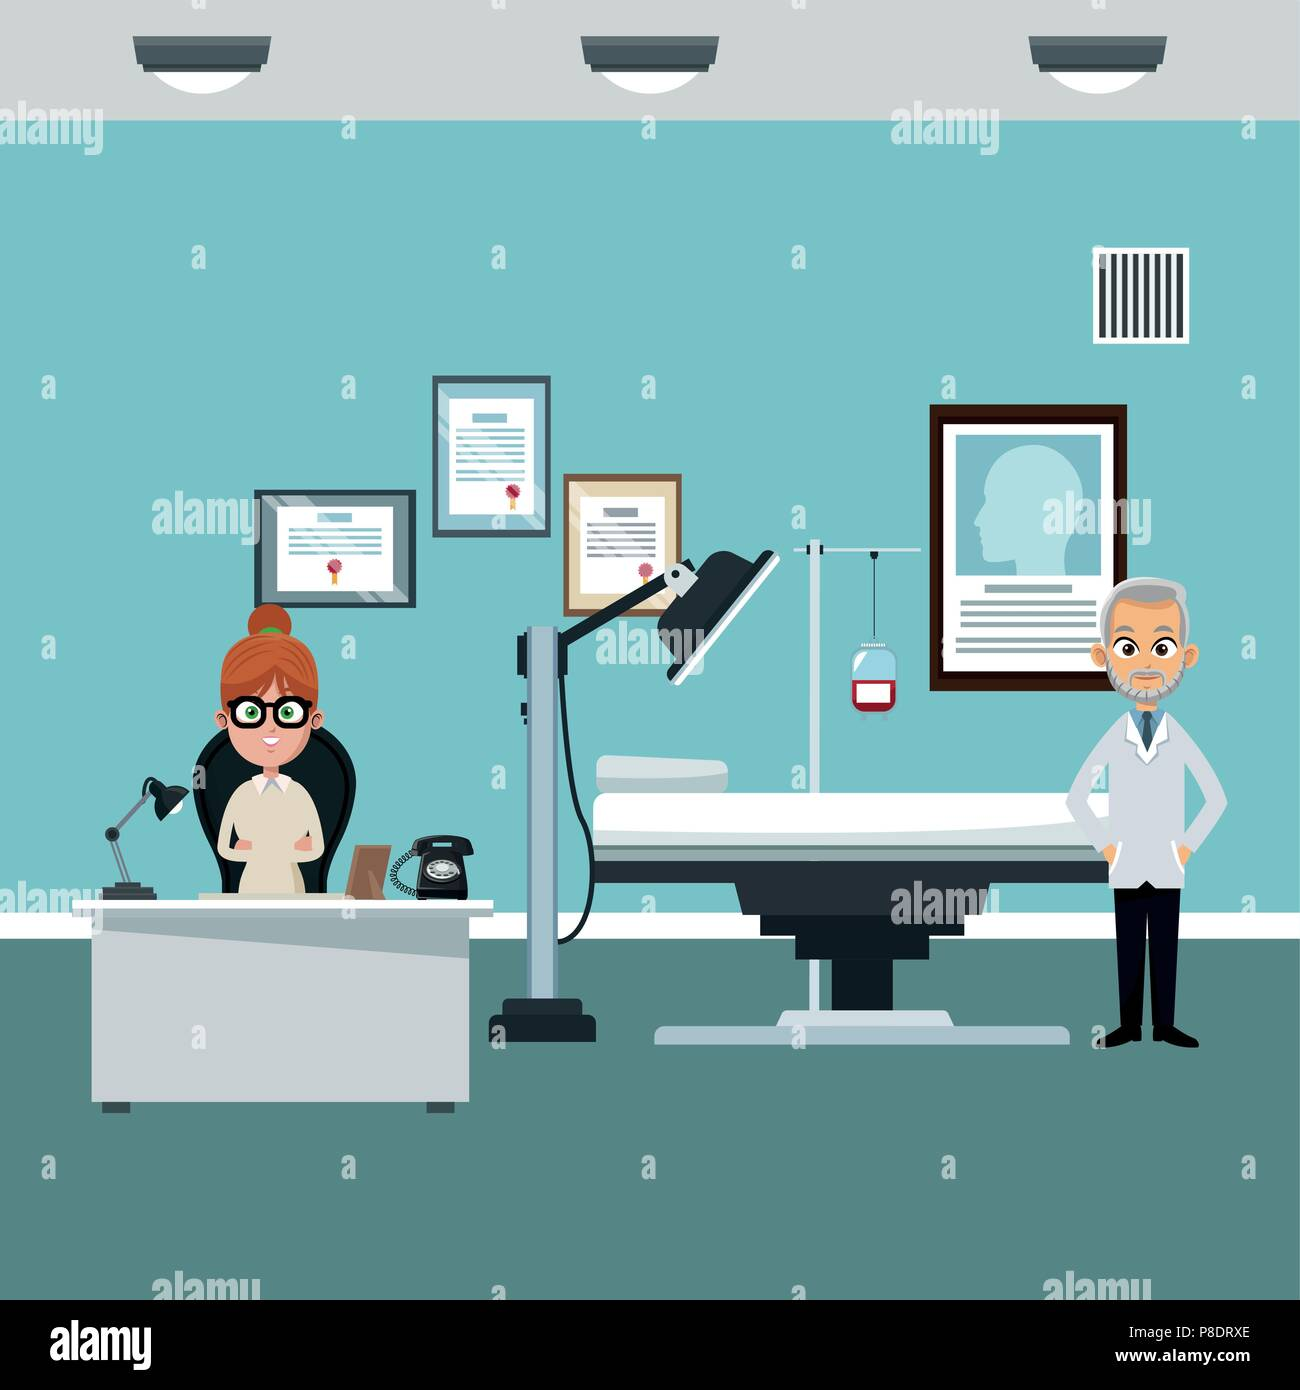 Doctors Office Cartoon Stock Vector Art Illustration Vector Image